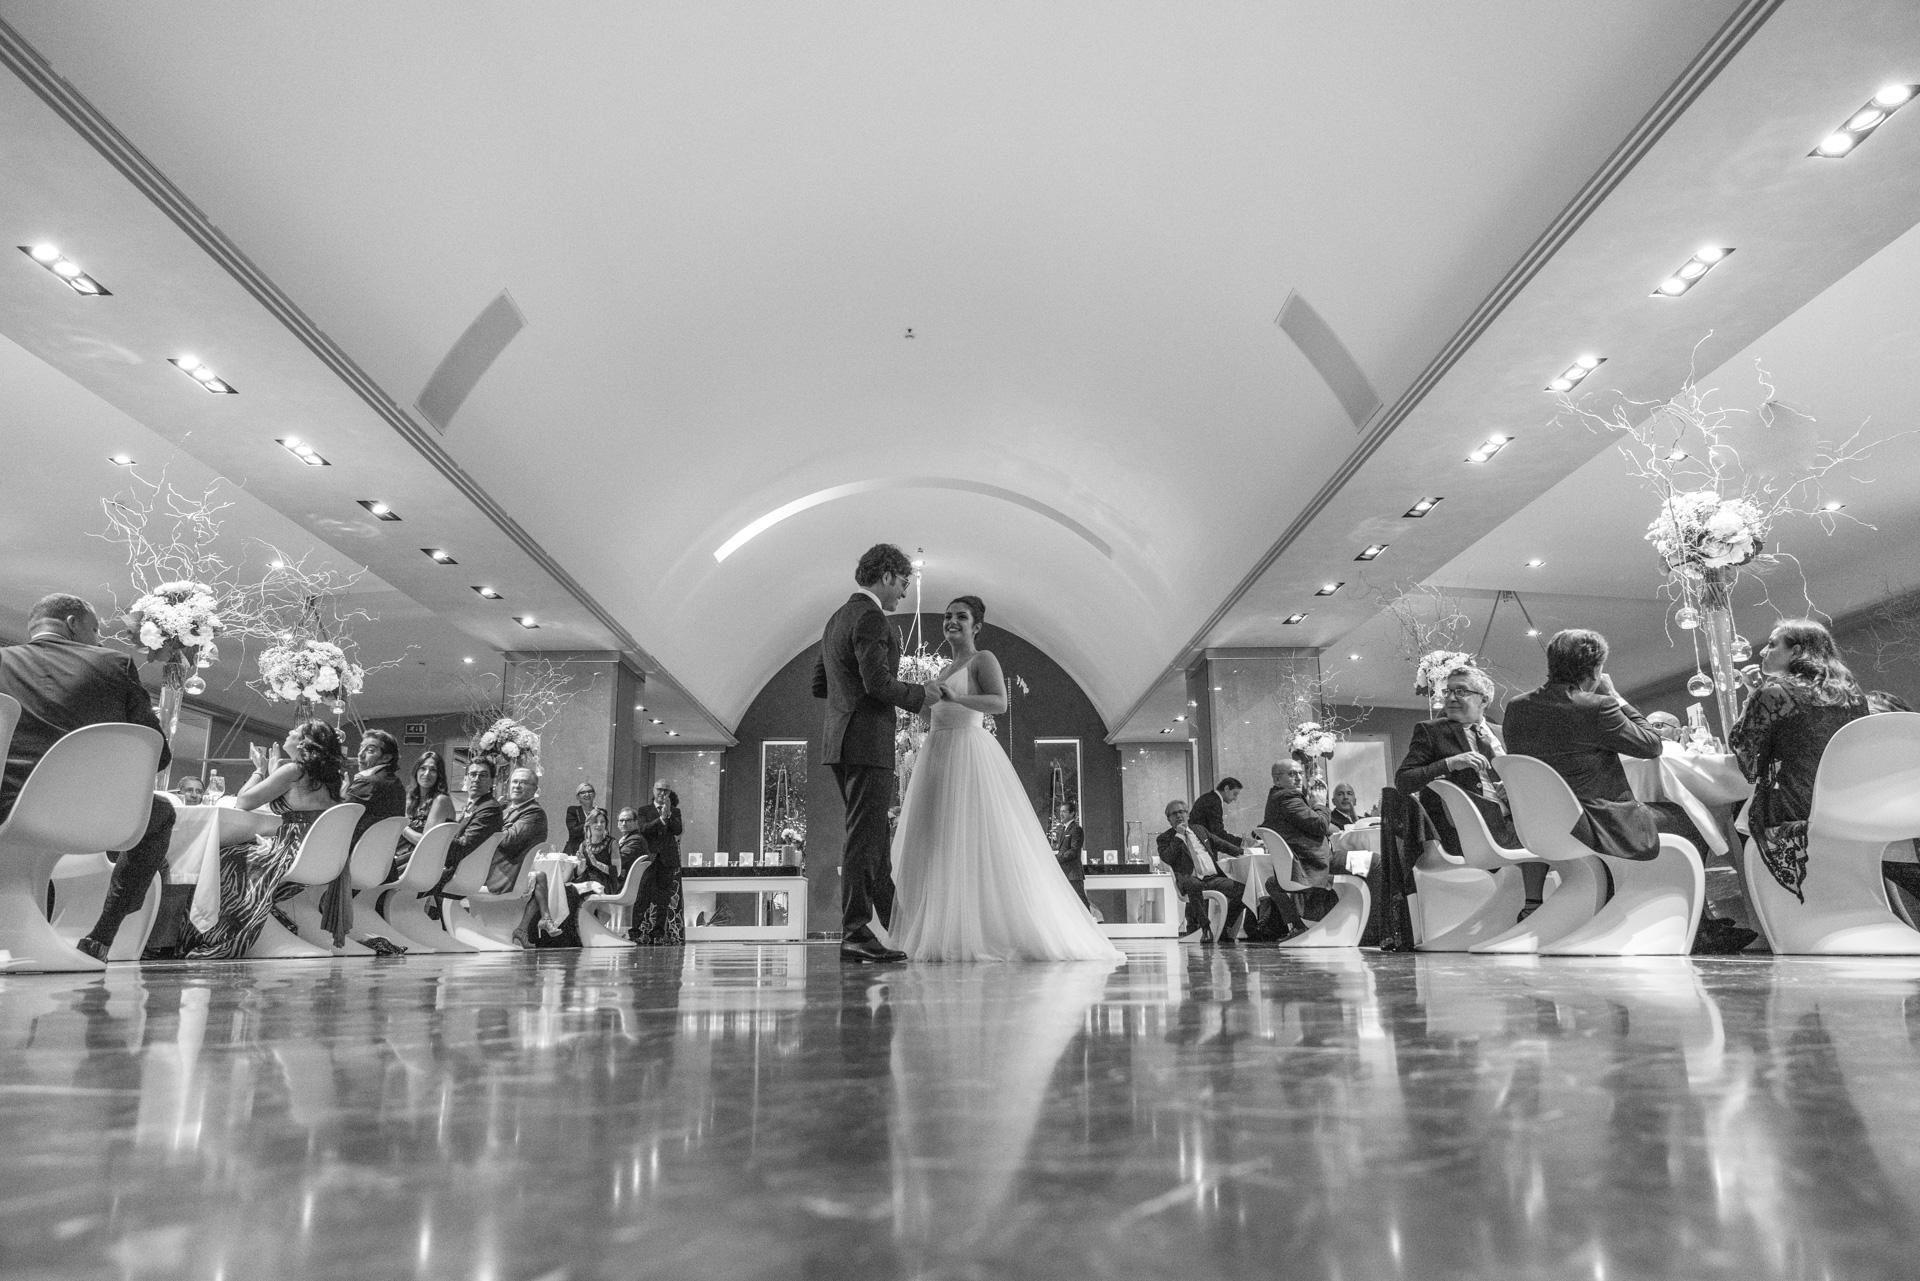 merafina photographer alfonso merafina fotografo wedding matrimonio andria francesca e antonio (23)